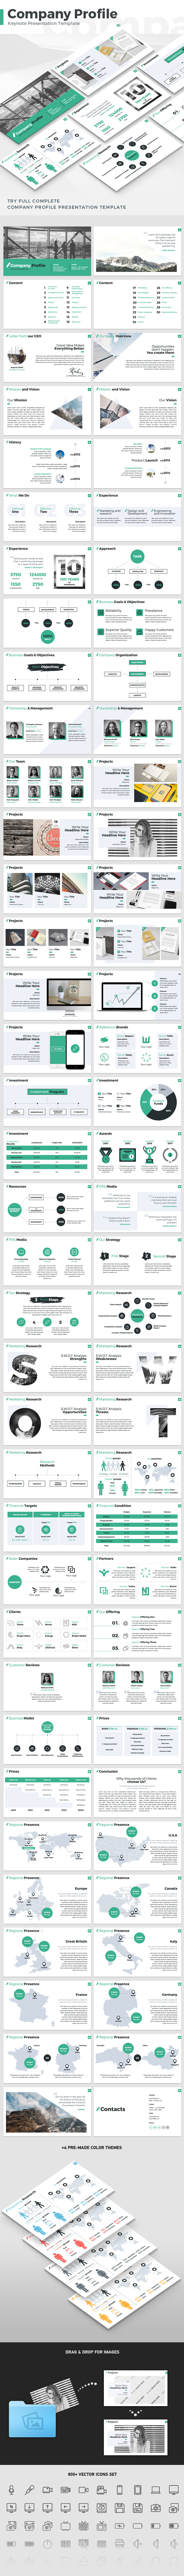 Company Profile - Keynote Presentation Template - Keynote Templates Presentation Templates